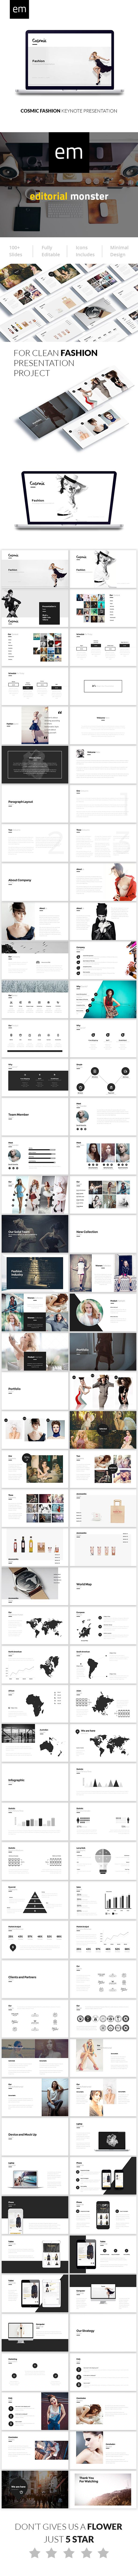 Cosmic Fashion Keynote Presentation — Keynote KEY #white #photography • Download ➝ https://graphicriver.net/item/cosmic-fashion-keynote-presentation/19054975?ref=pxcr